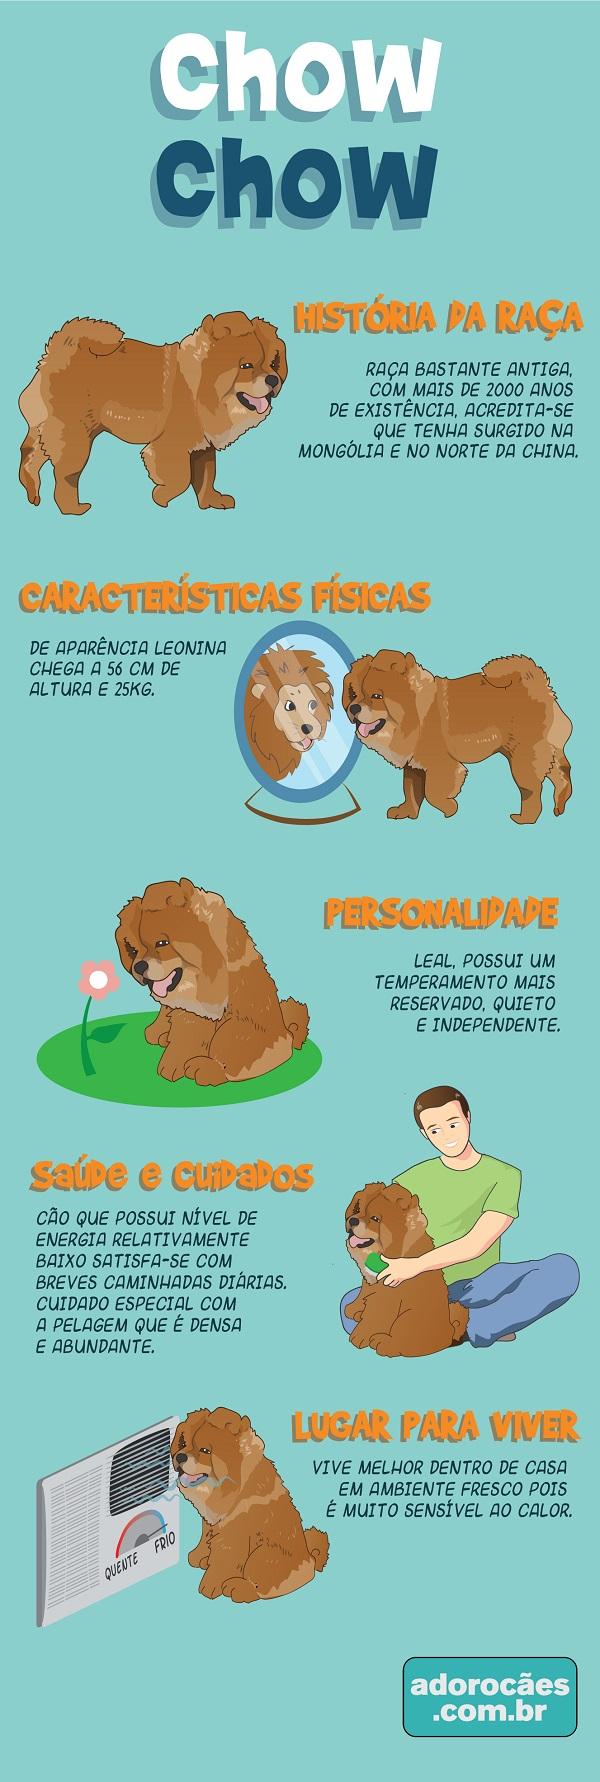 Chow Chow infografico